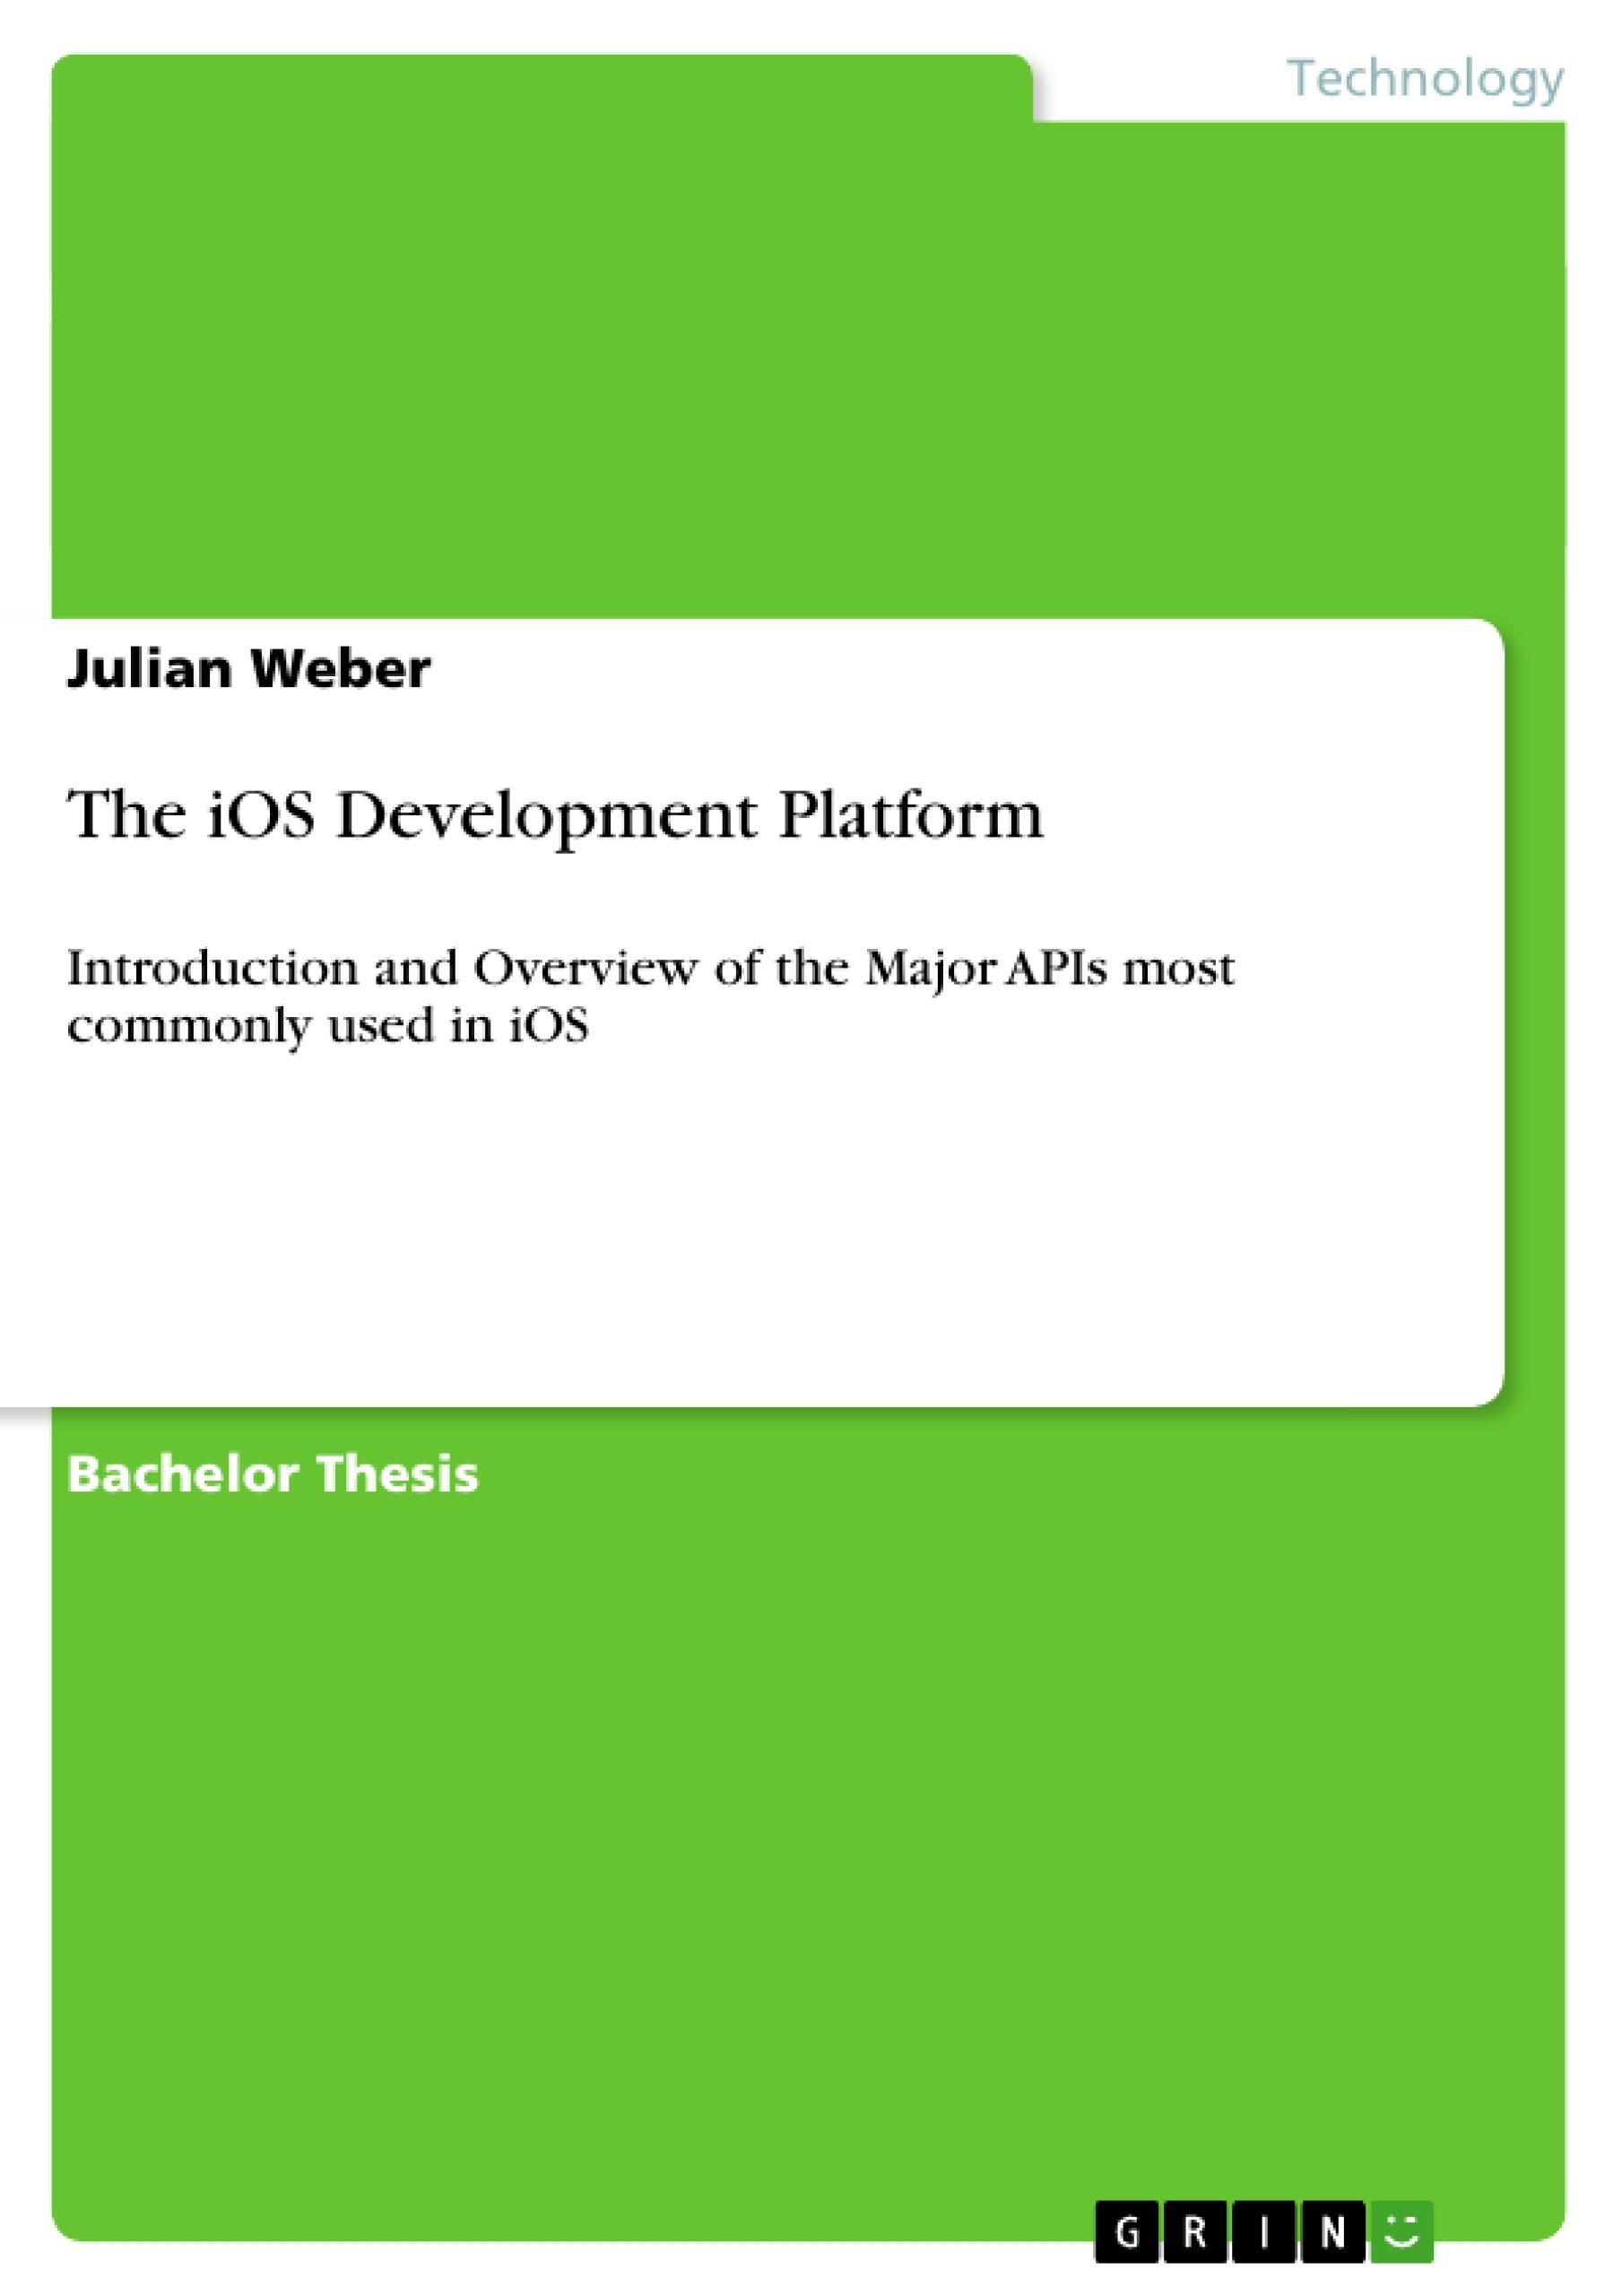 Title: The iOS Development Platform